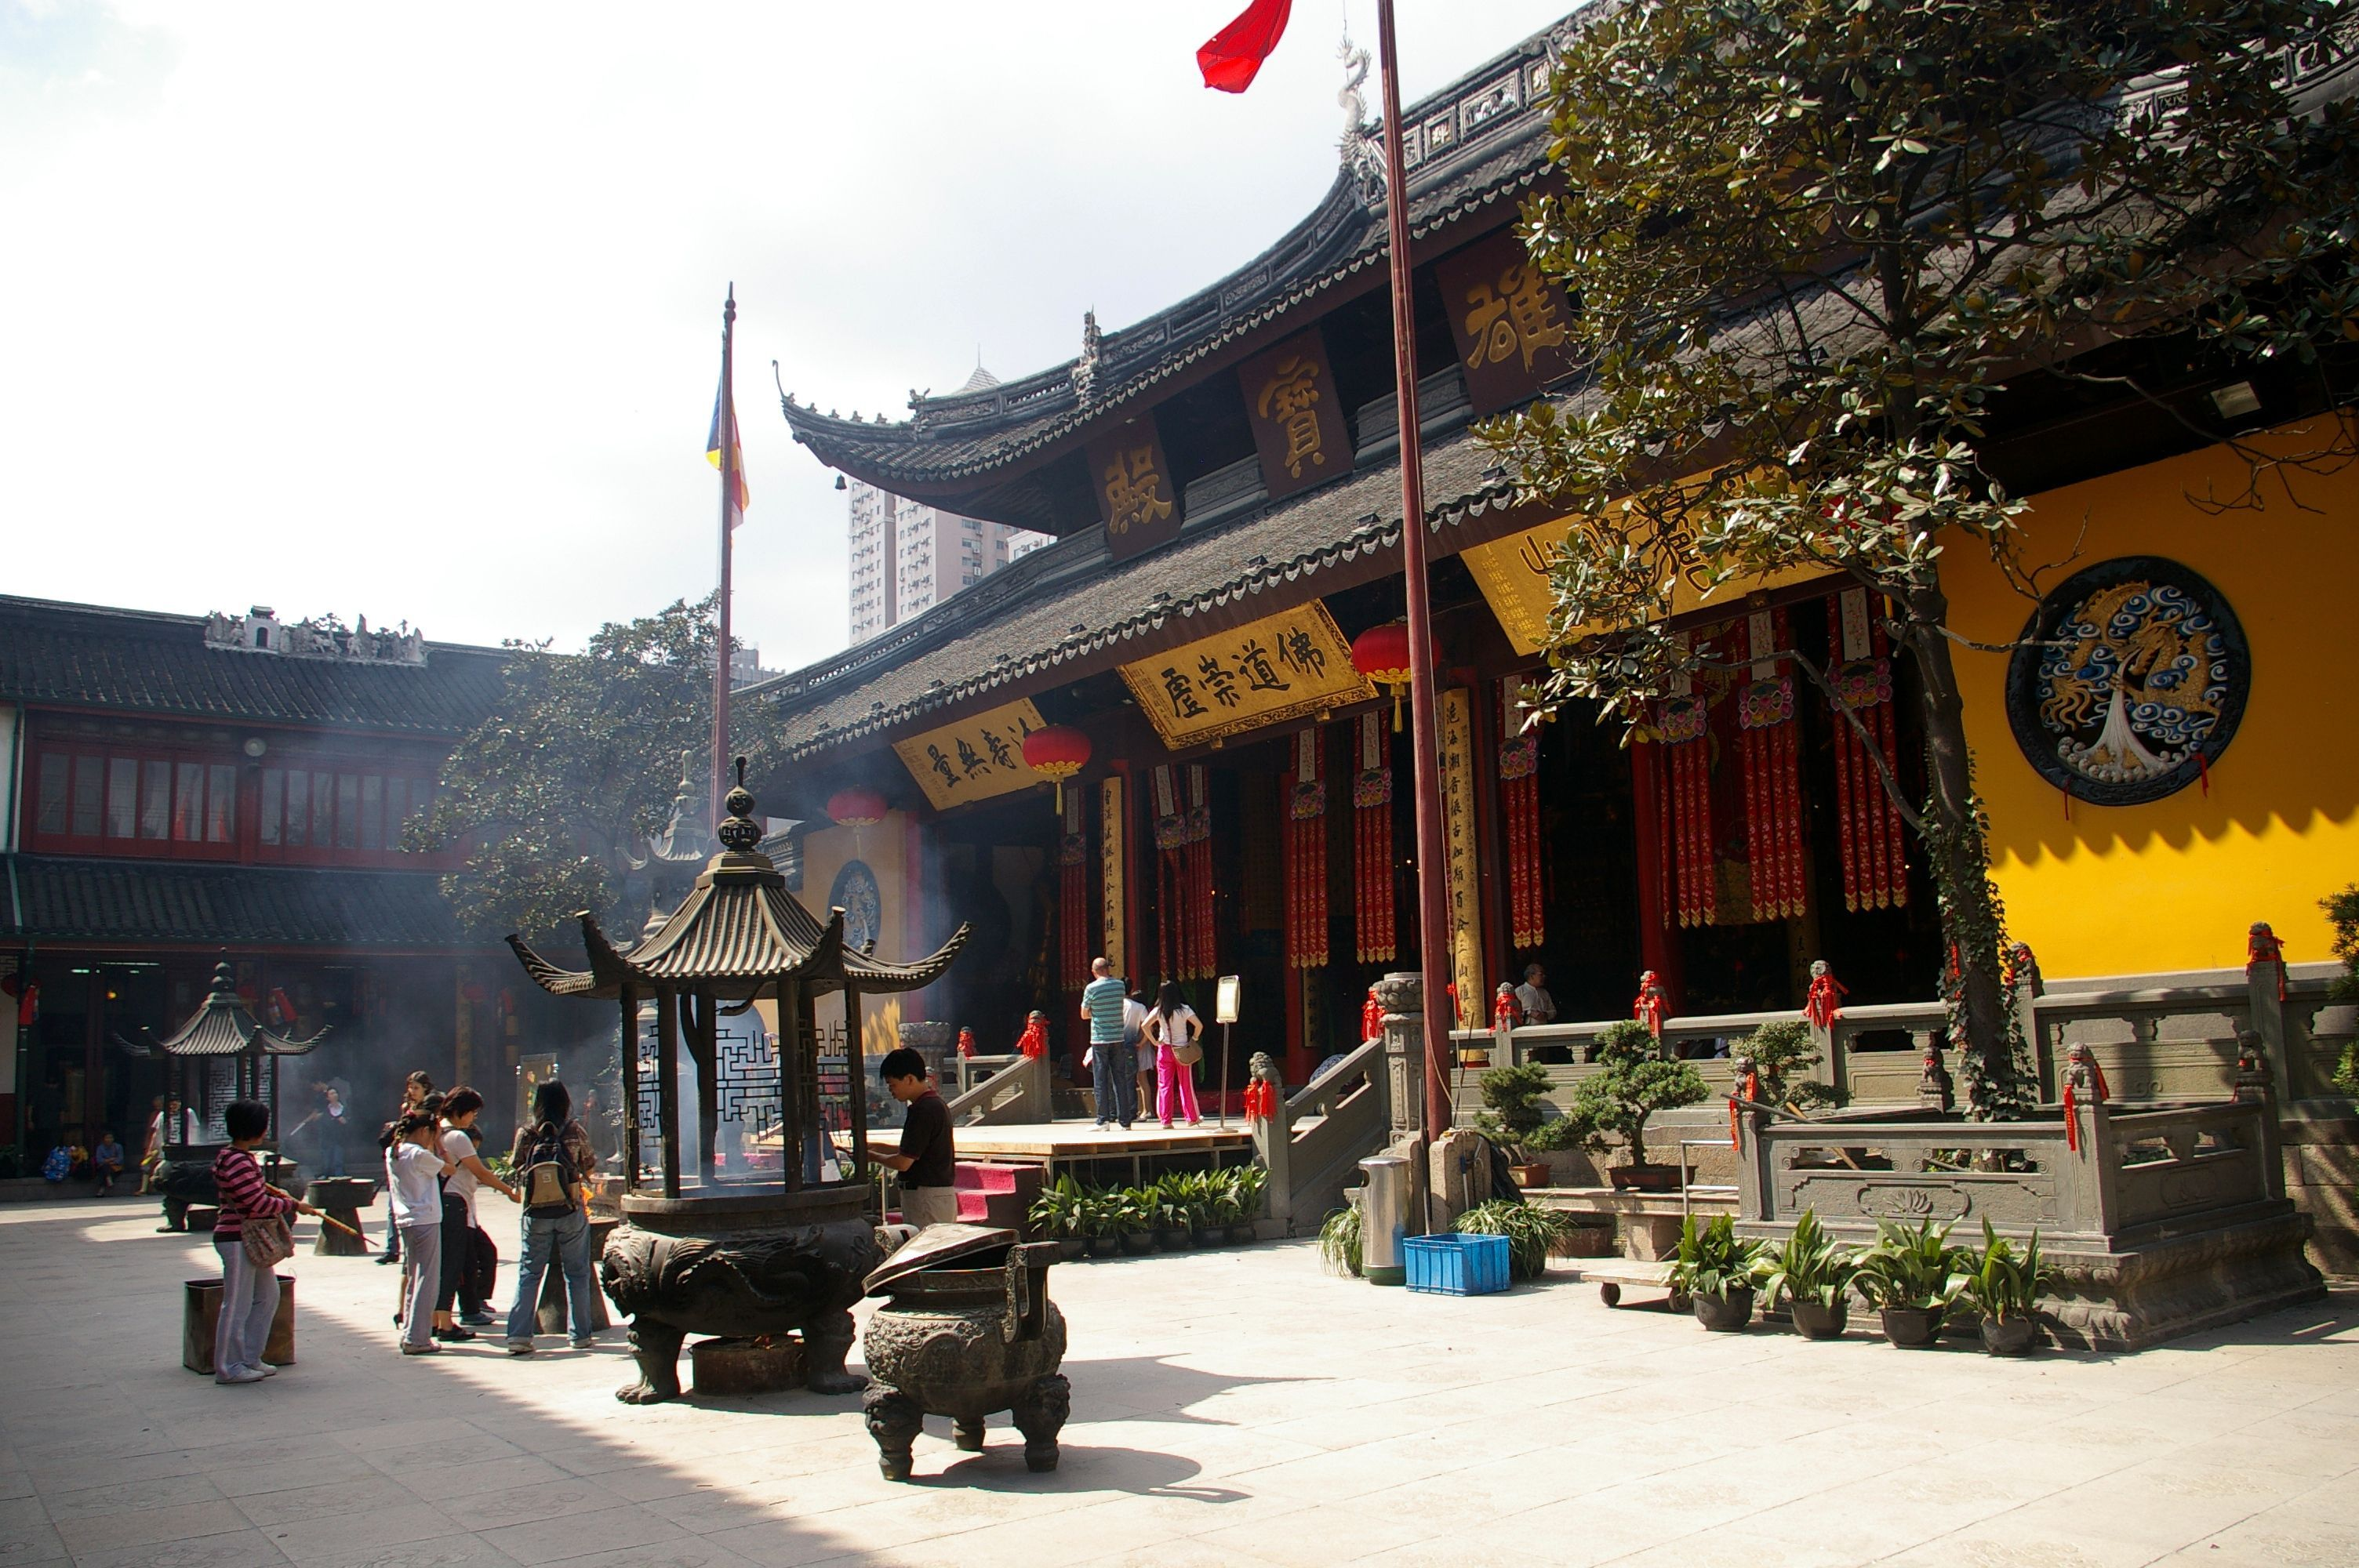 Картинки по запросу jade buddha temple shanghai site:pinterest.com